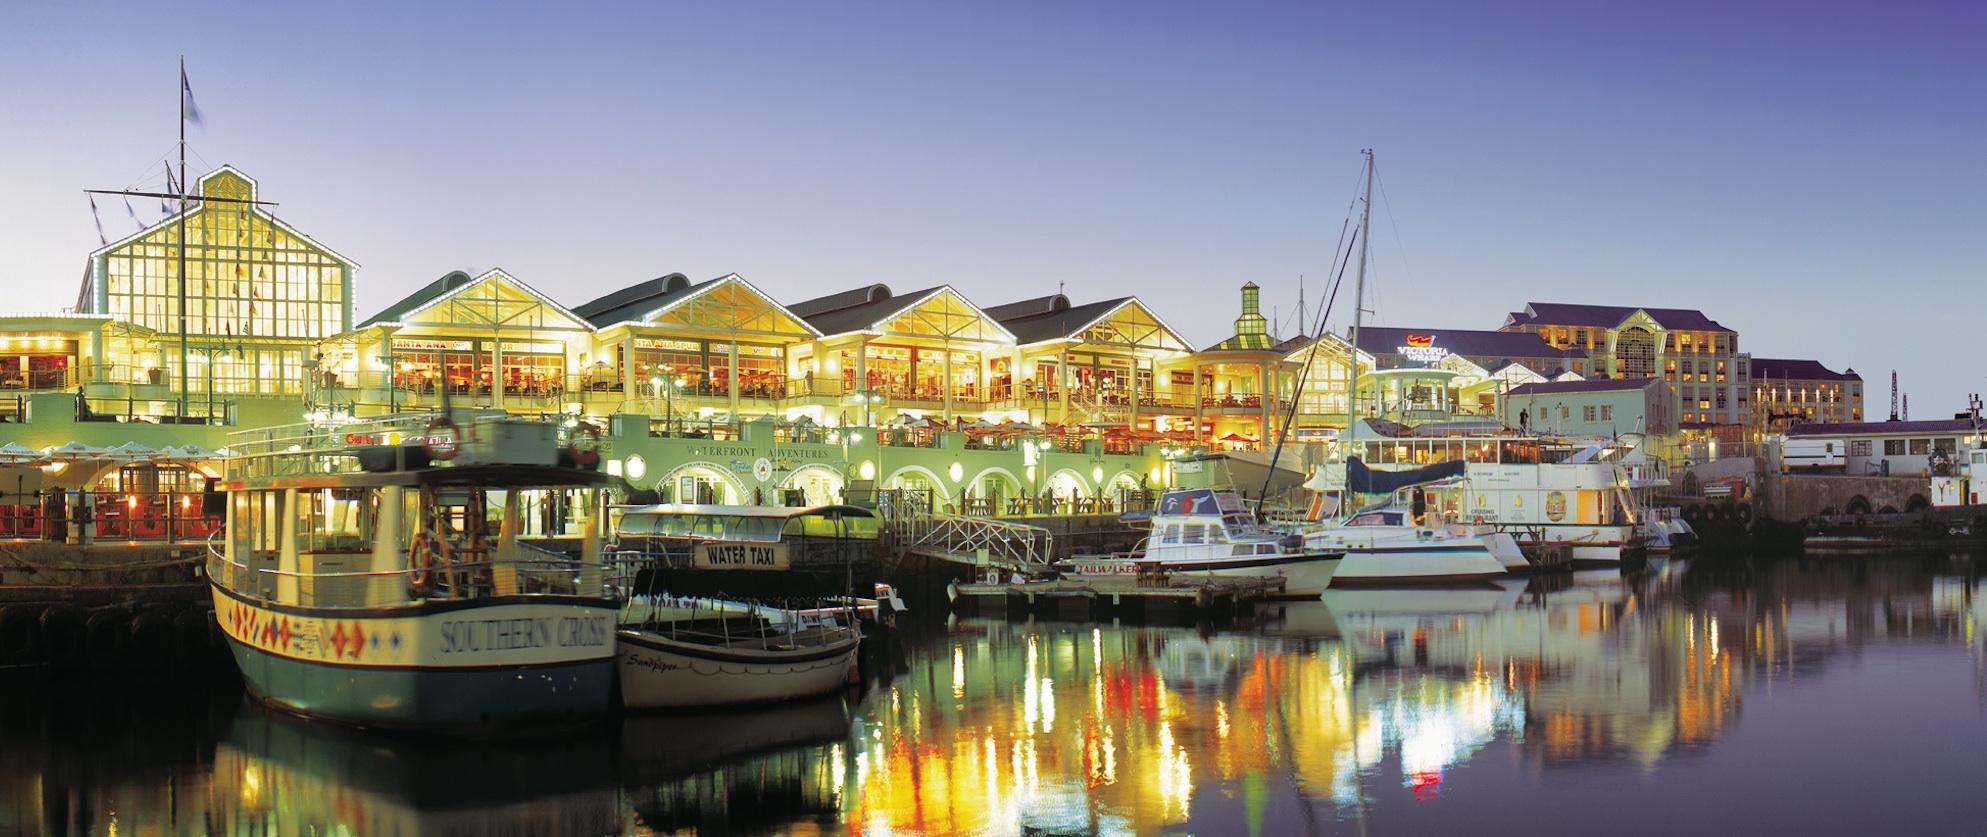 Best of South Africa - City, Safari, Winelands